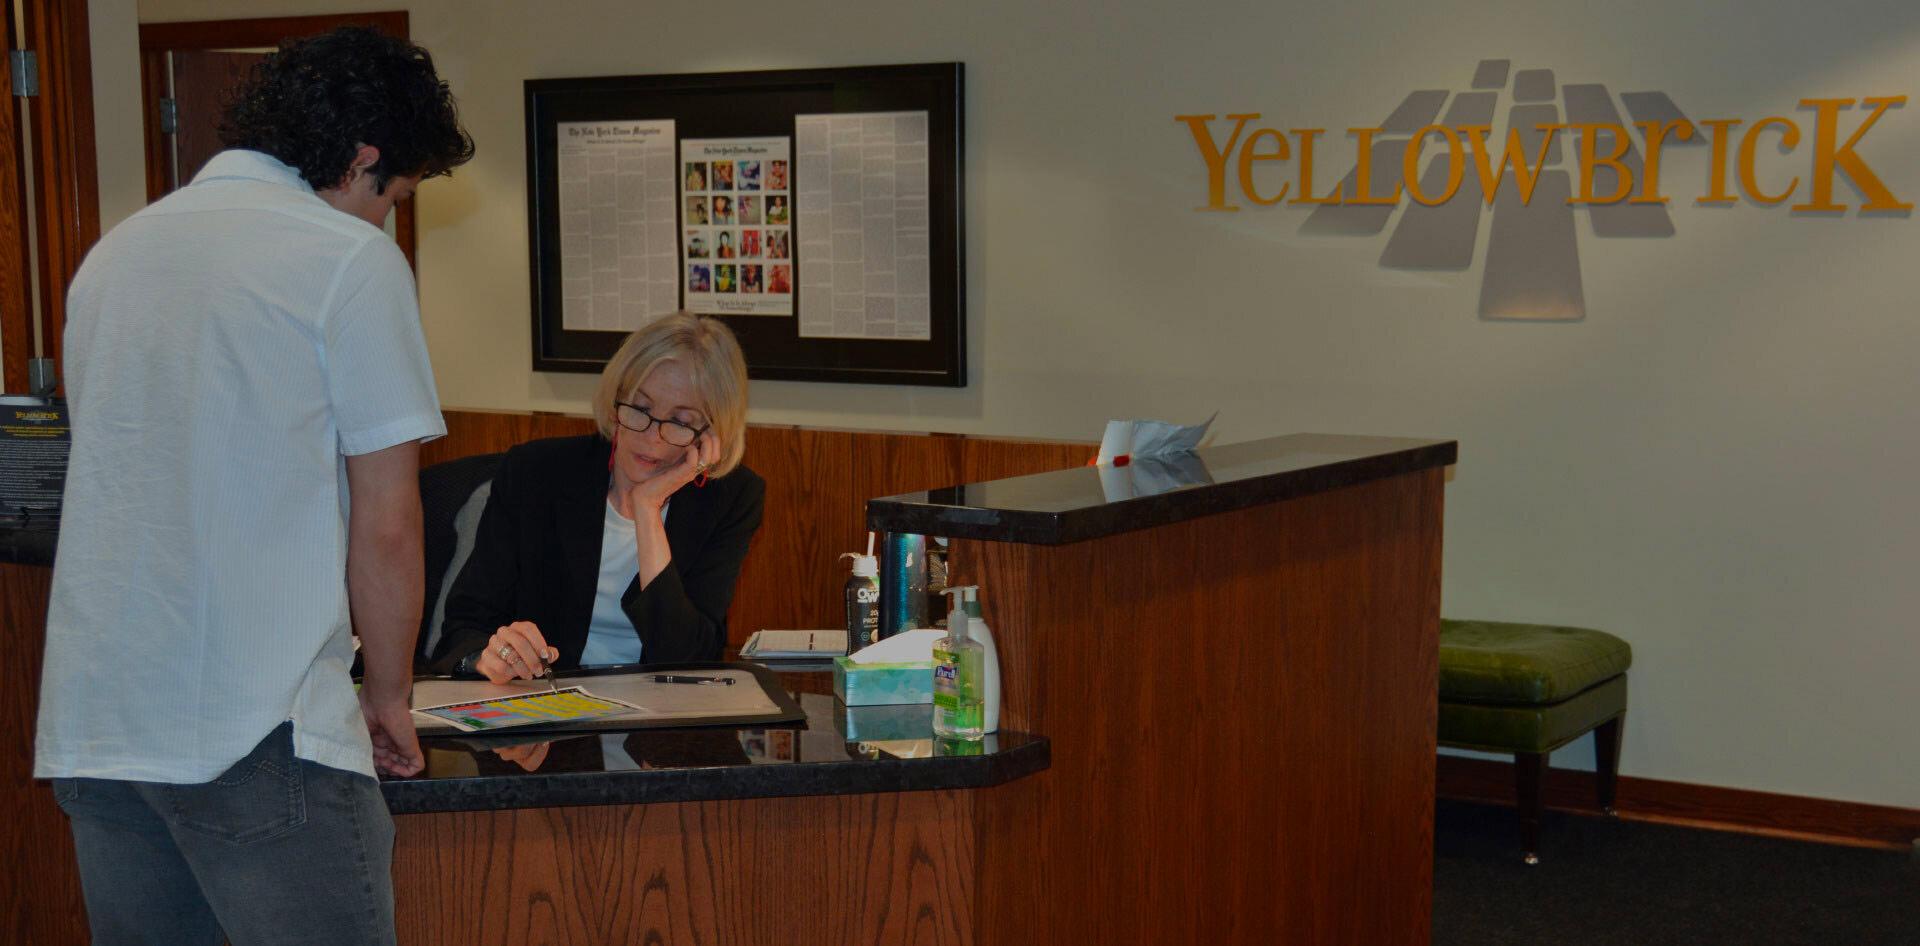 Welcome to Yellowbrick